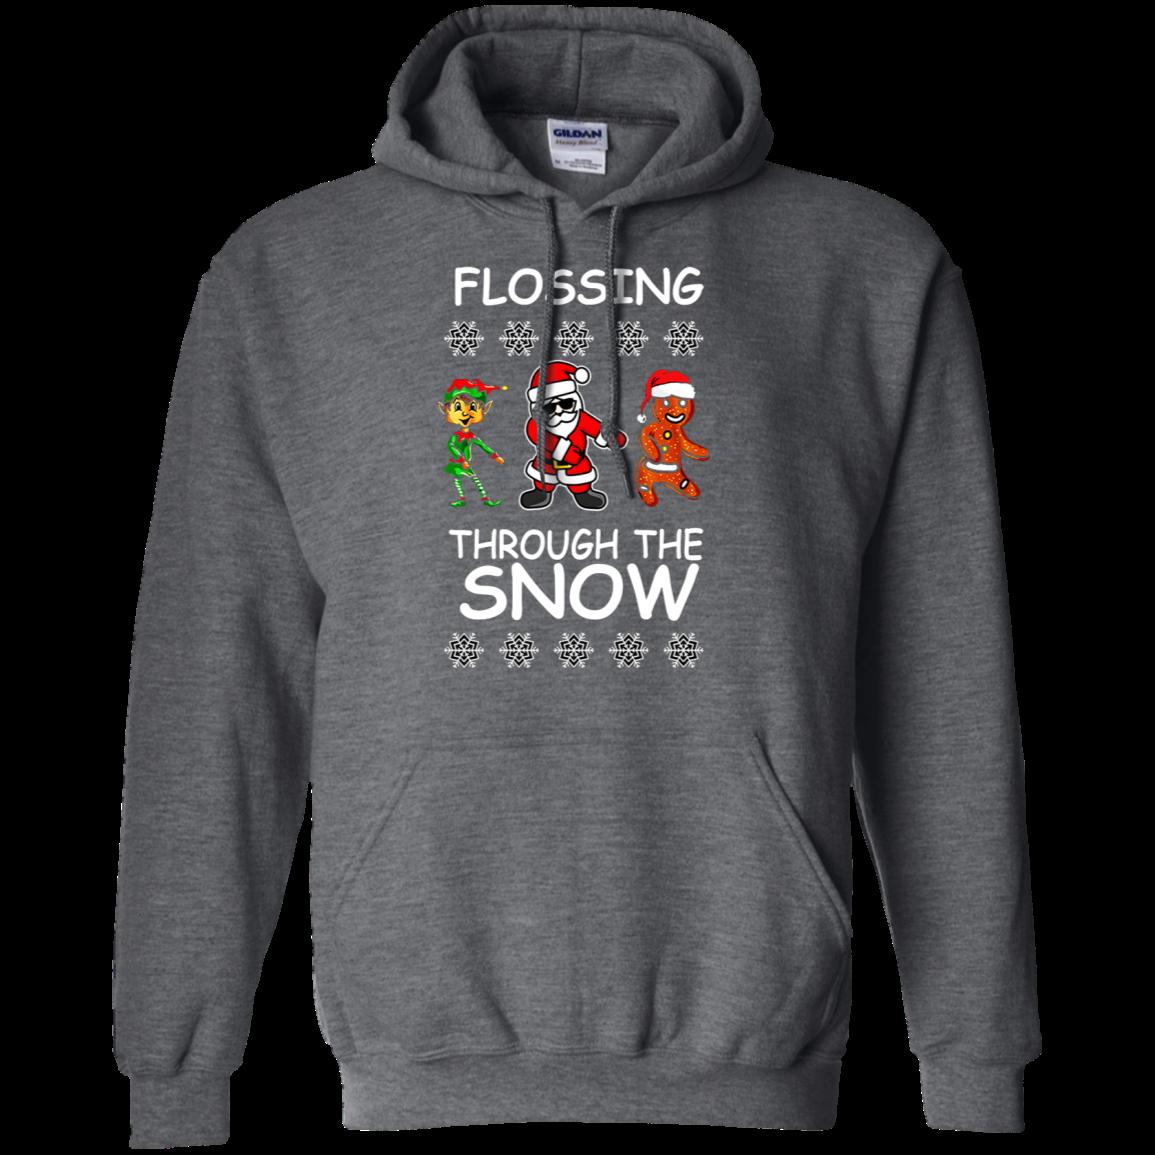 Flossing Through The Snow Christmas Shirt G185 Pullover 8 Oz